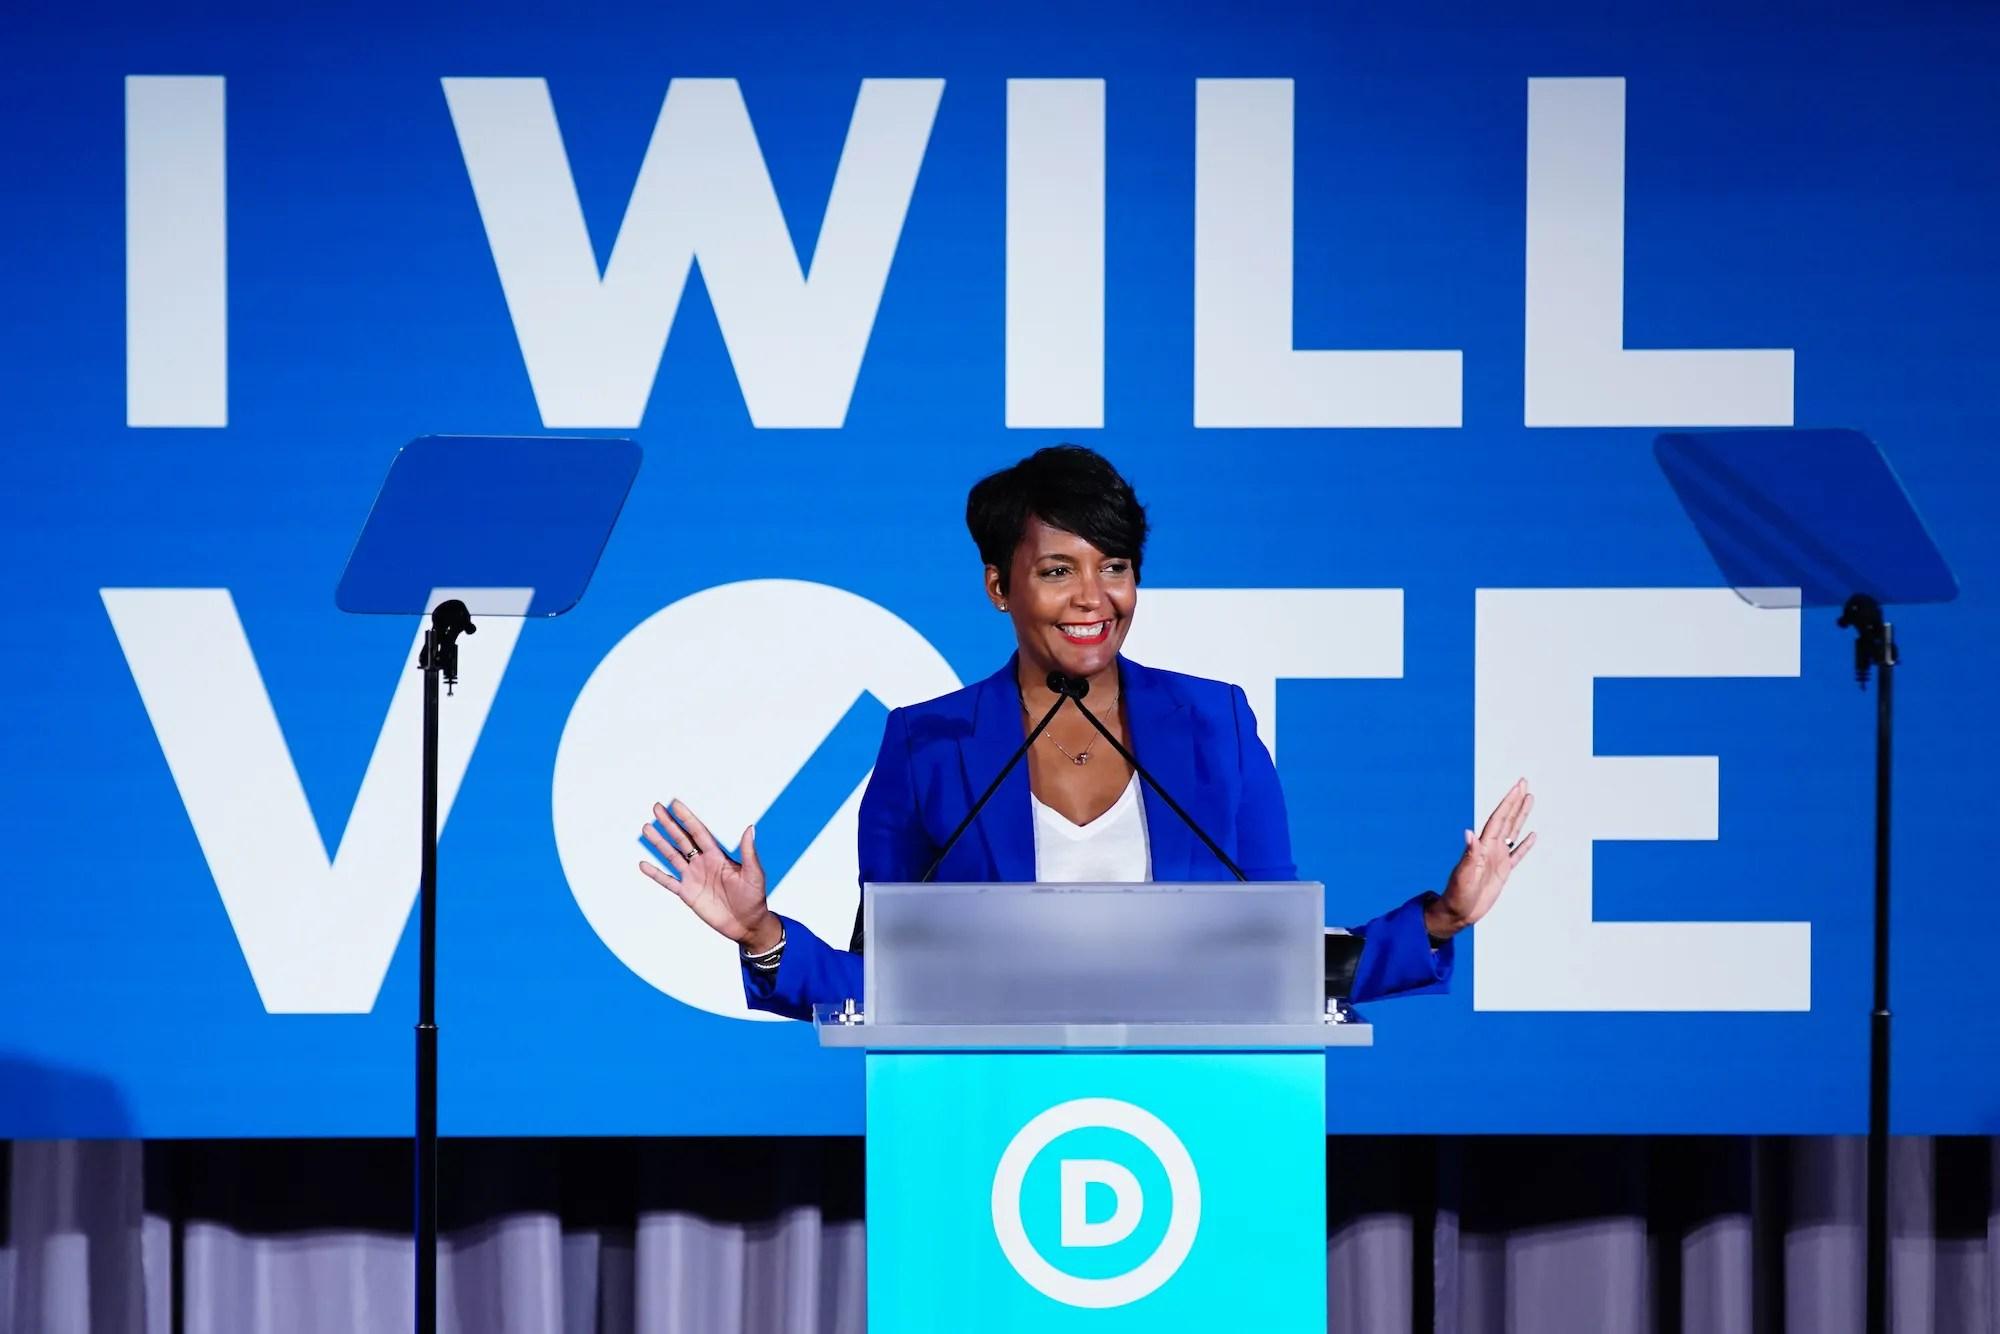 Atlanta Mayor Keisha Lance Bottoms (D) among short list of Biden VP choices @keishabottoms #keishabottoms